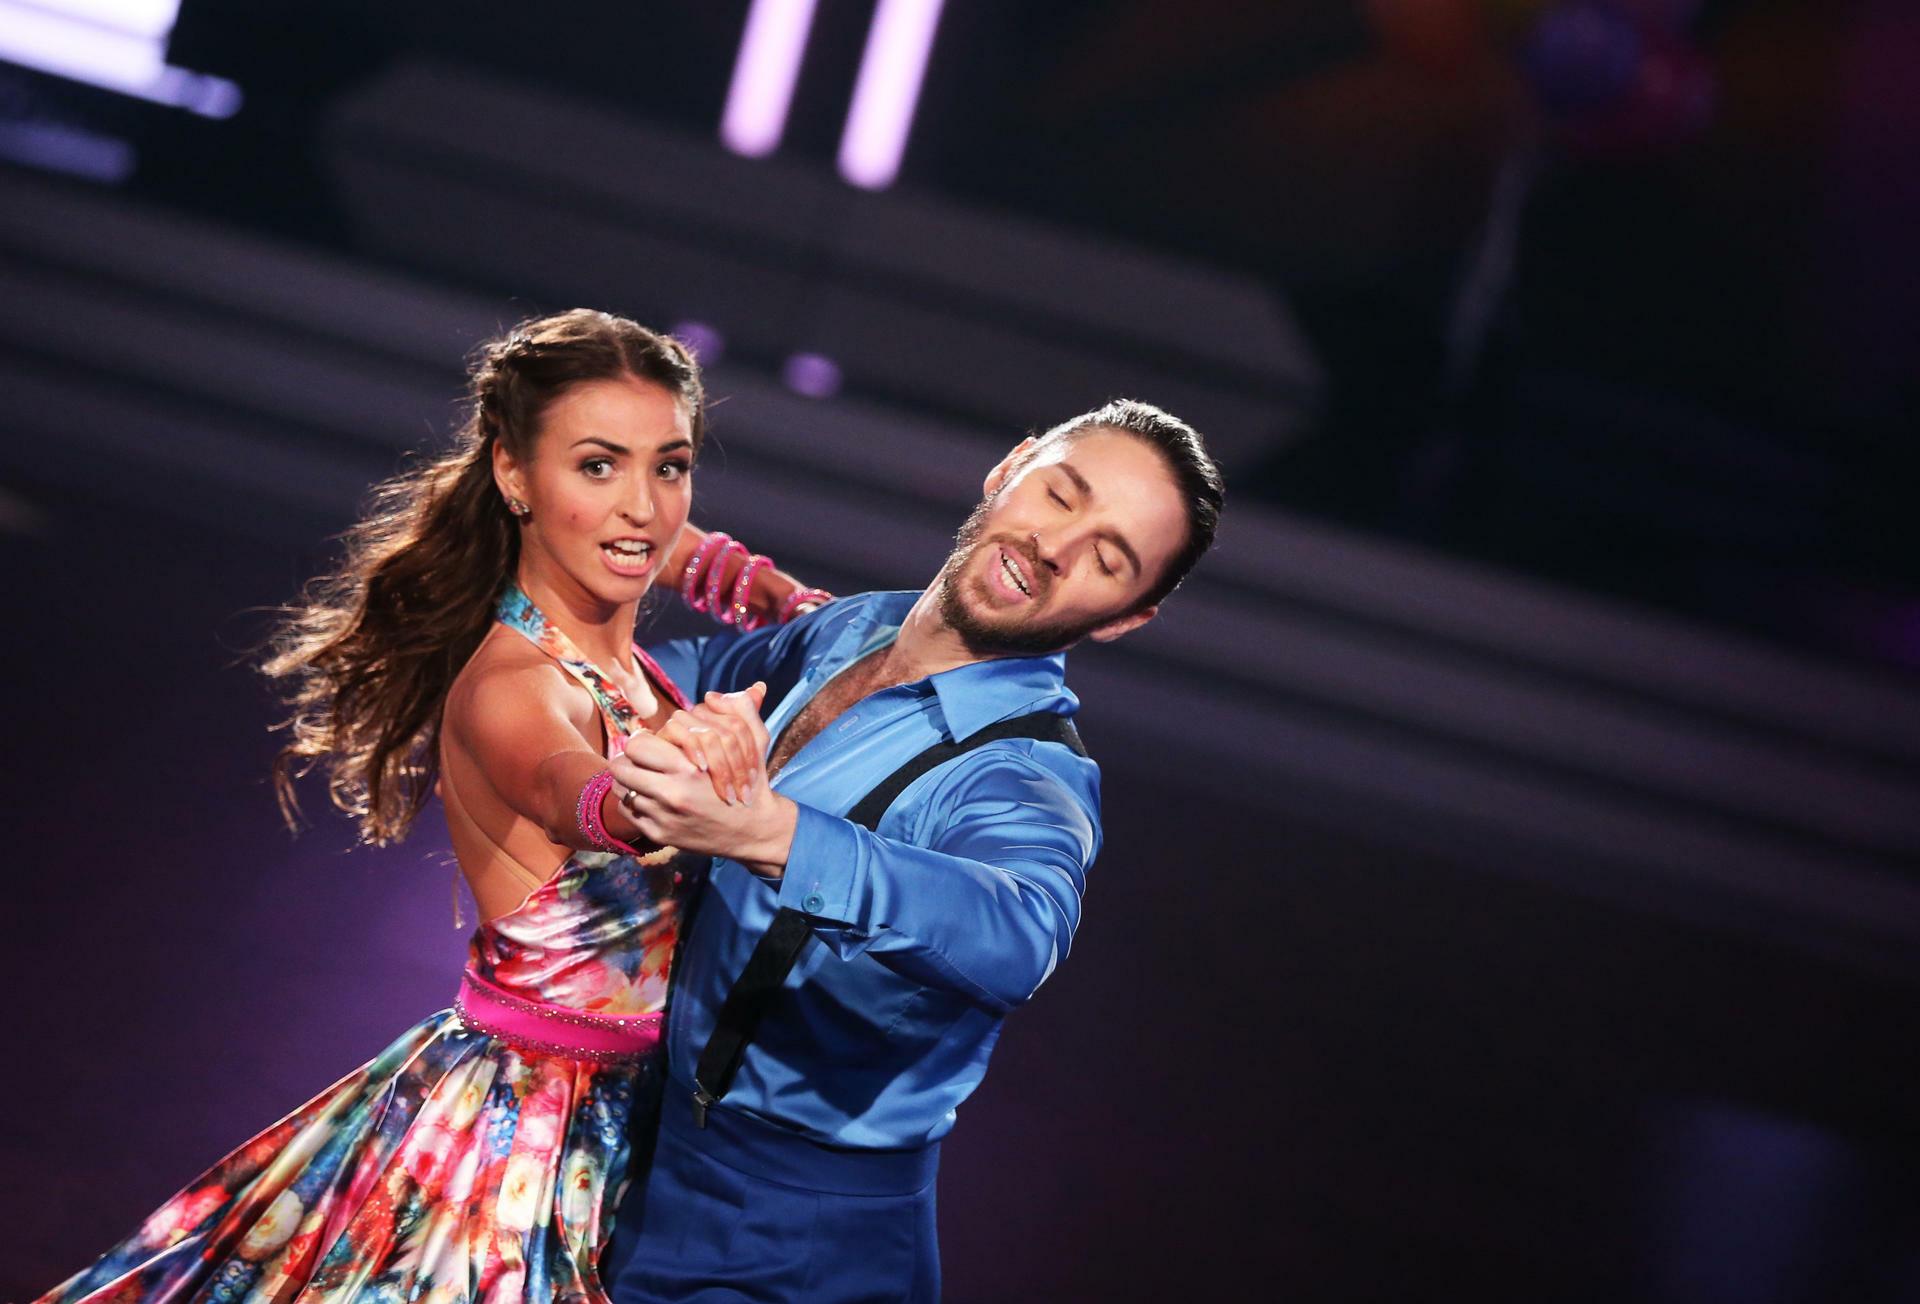 Ekaterina Leonova Lets Dance Star Fürchtet Abschiebung